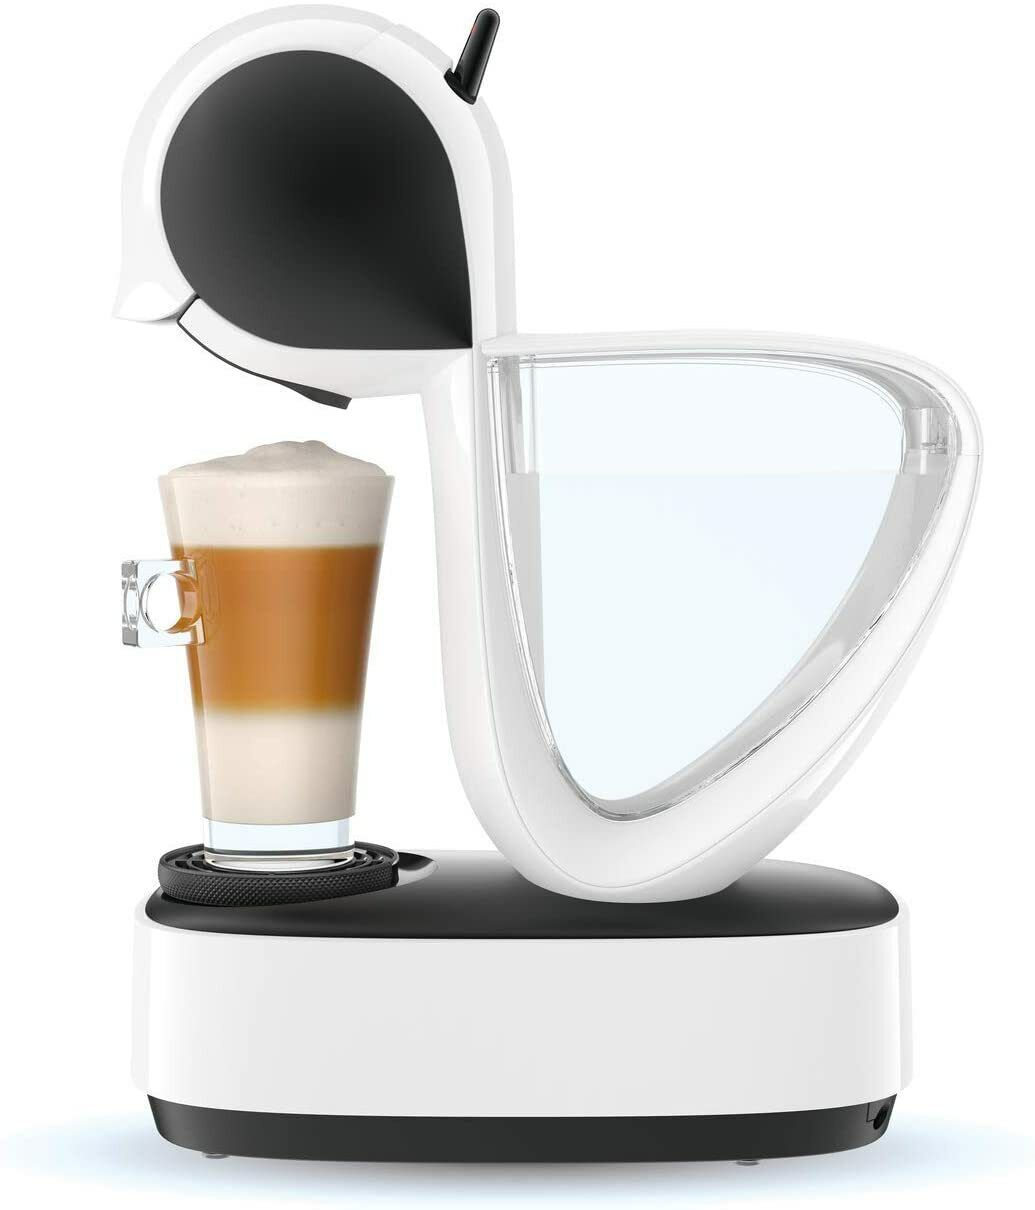 Krups infinissima cafetera café Nescafé Dolce Gusto multi-boissons Café, expreso